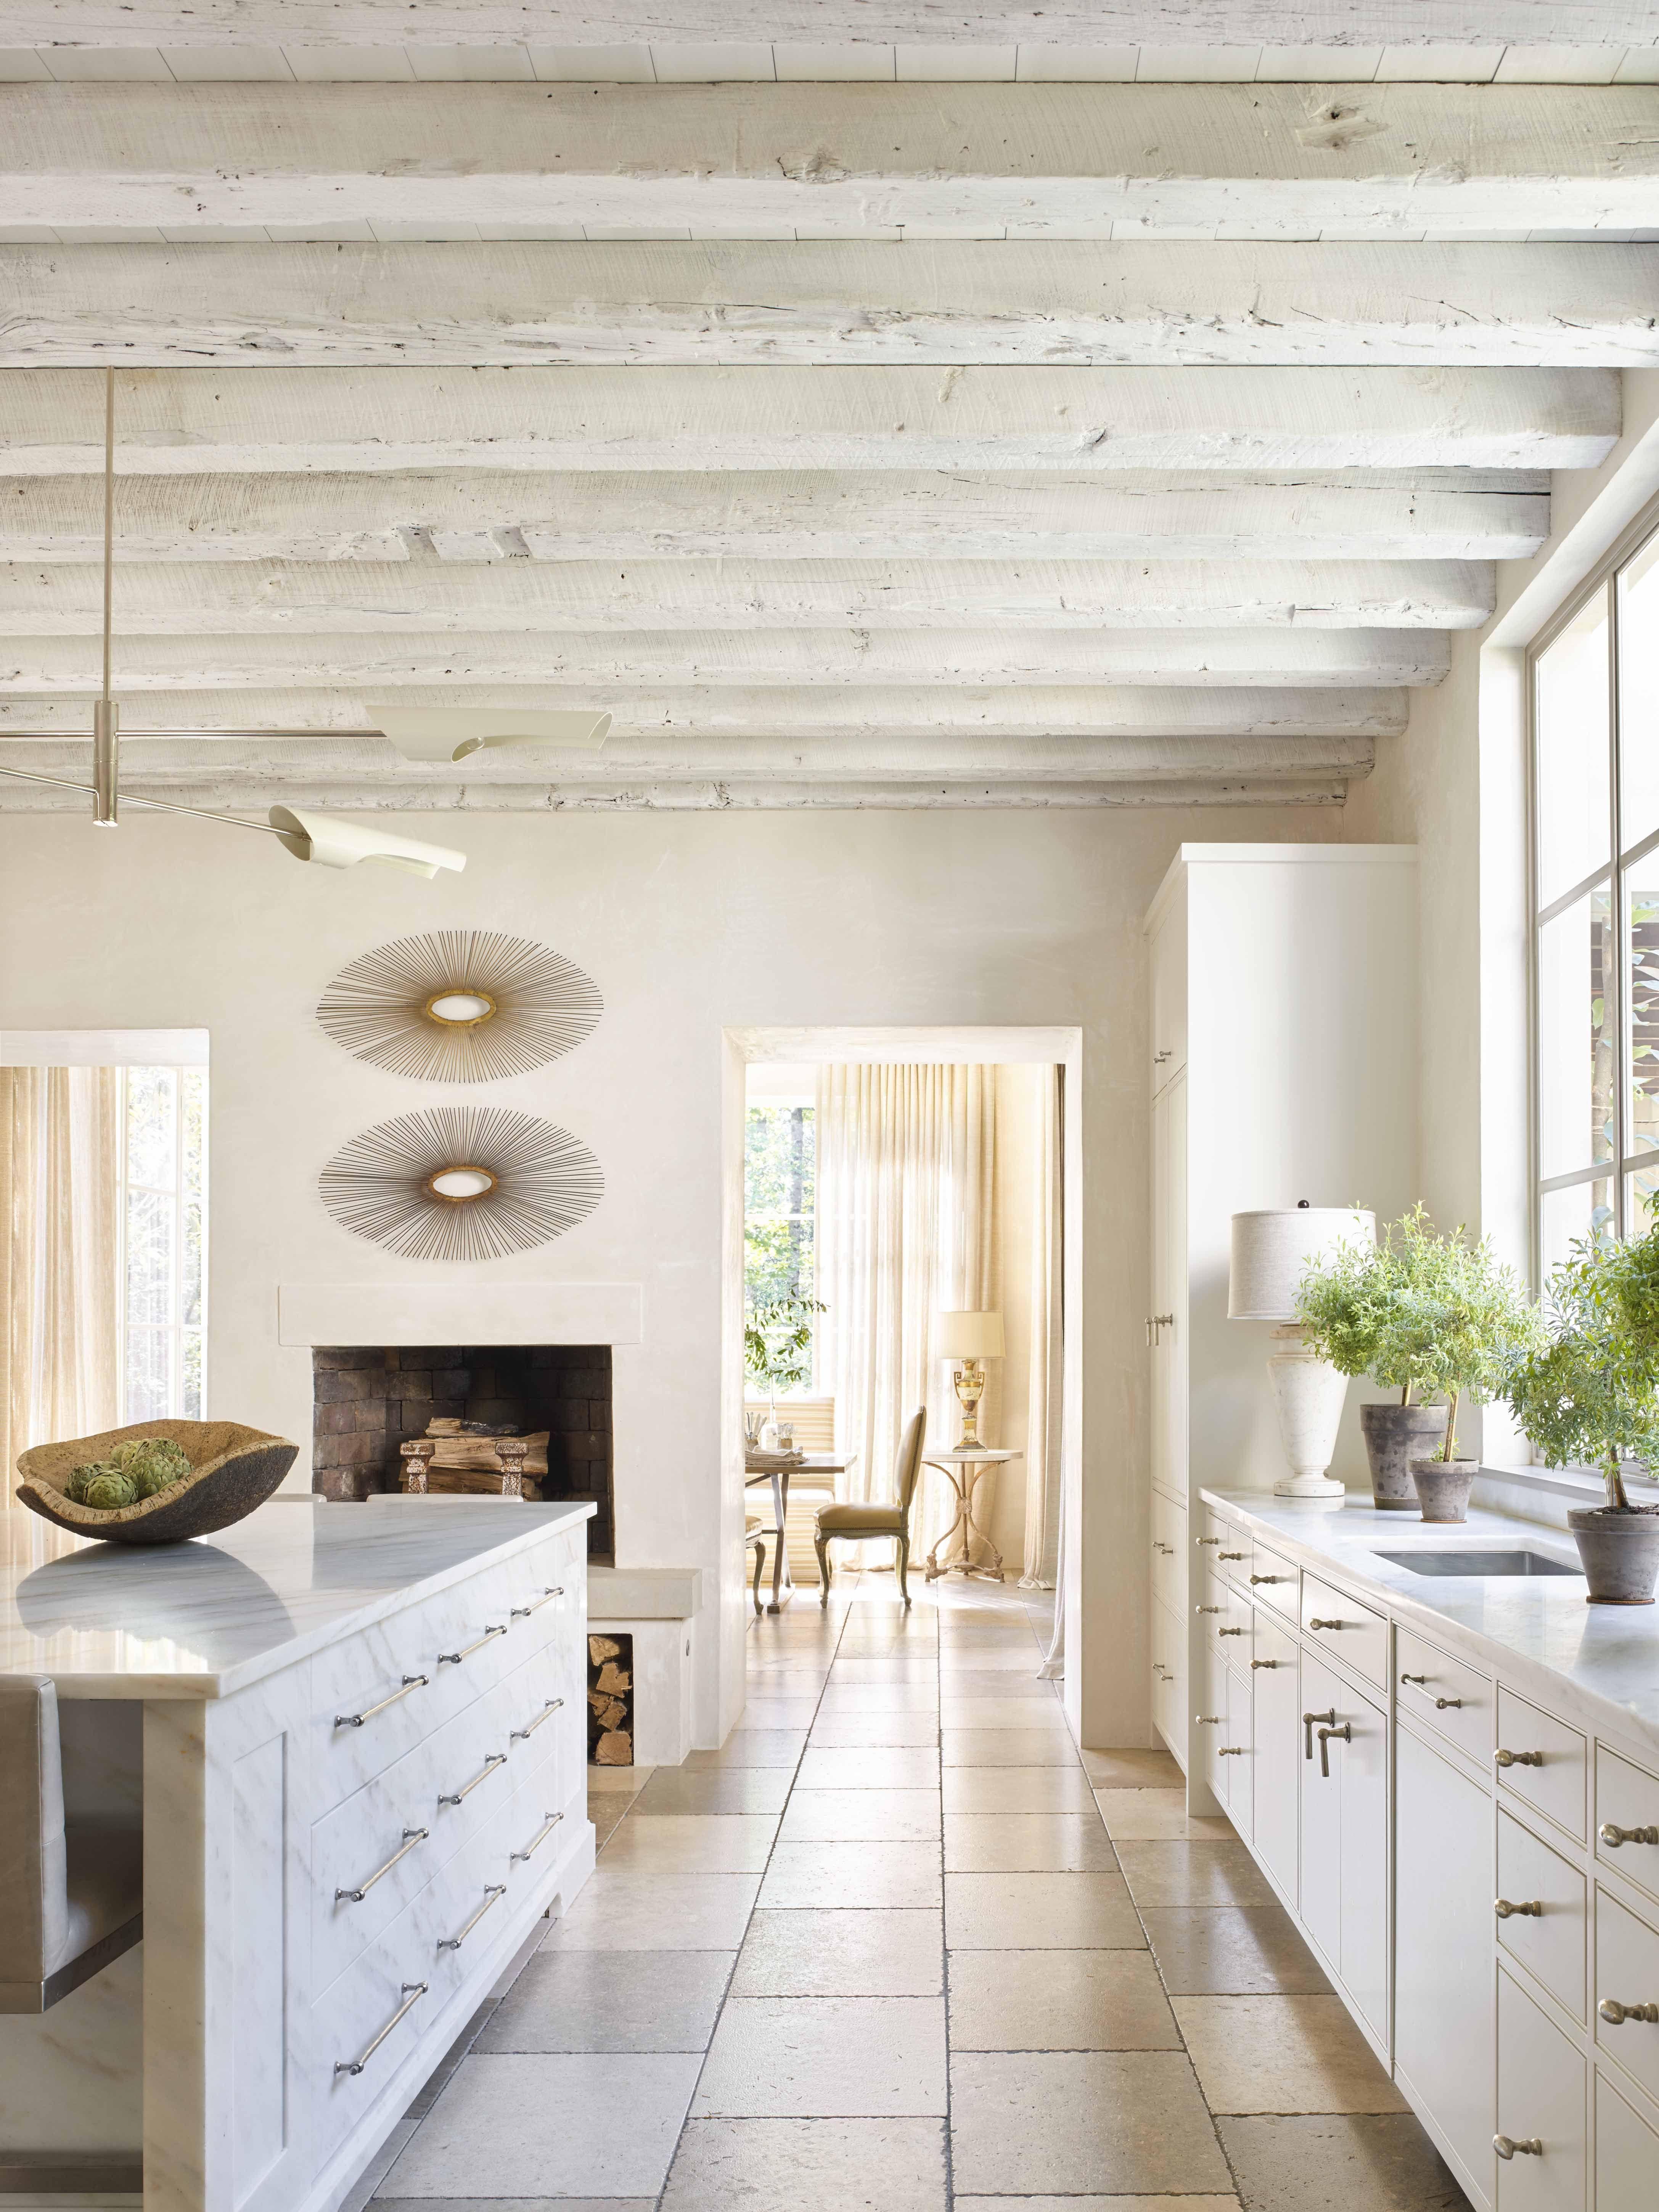 20 White Kitchen Ideas - All White Kitchen Designs and Decor